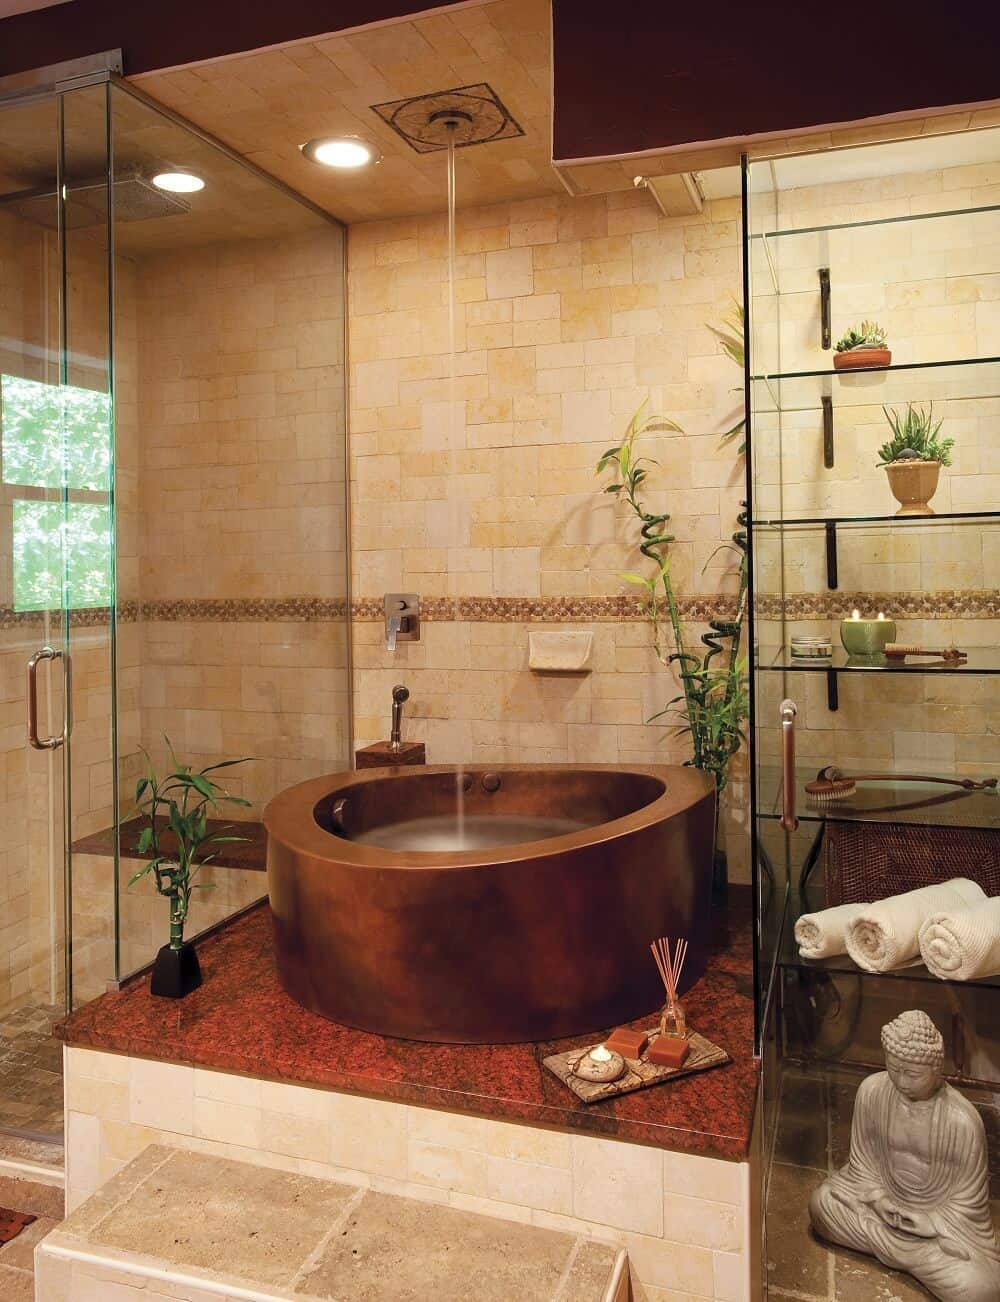 Copper Circular Japanese Whirlpool Bath